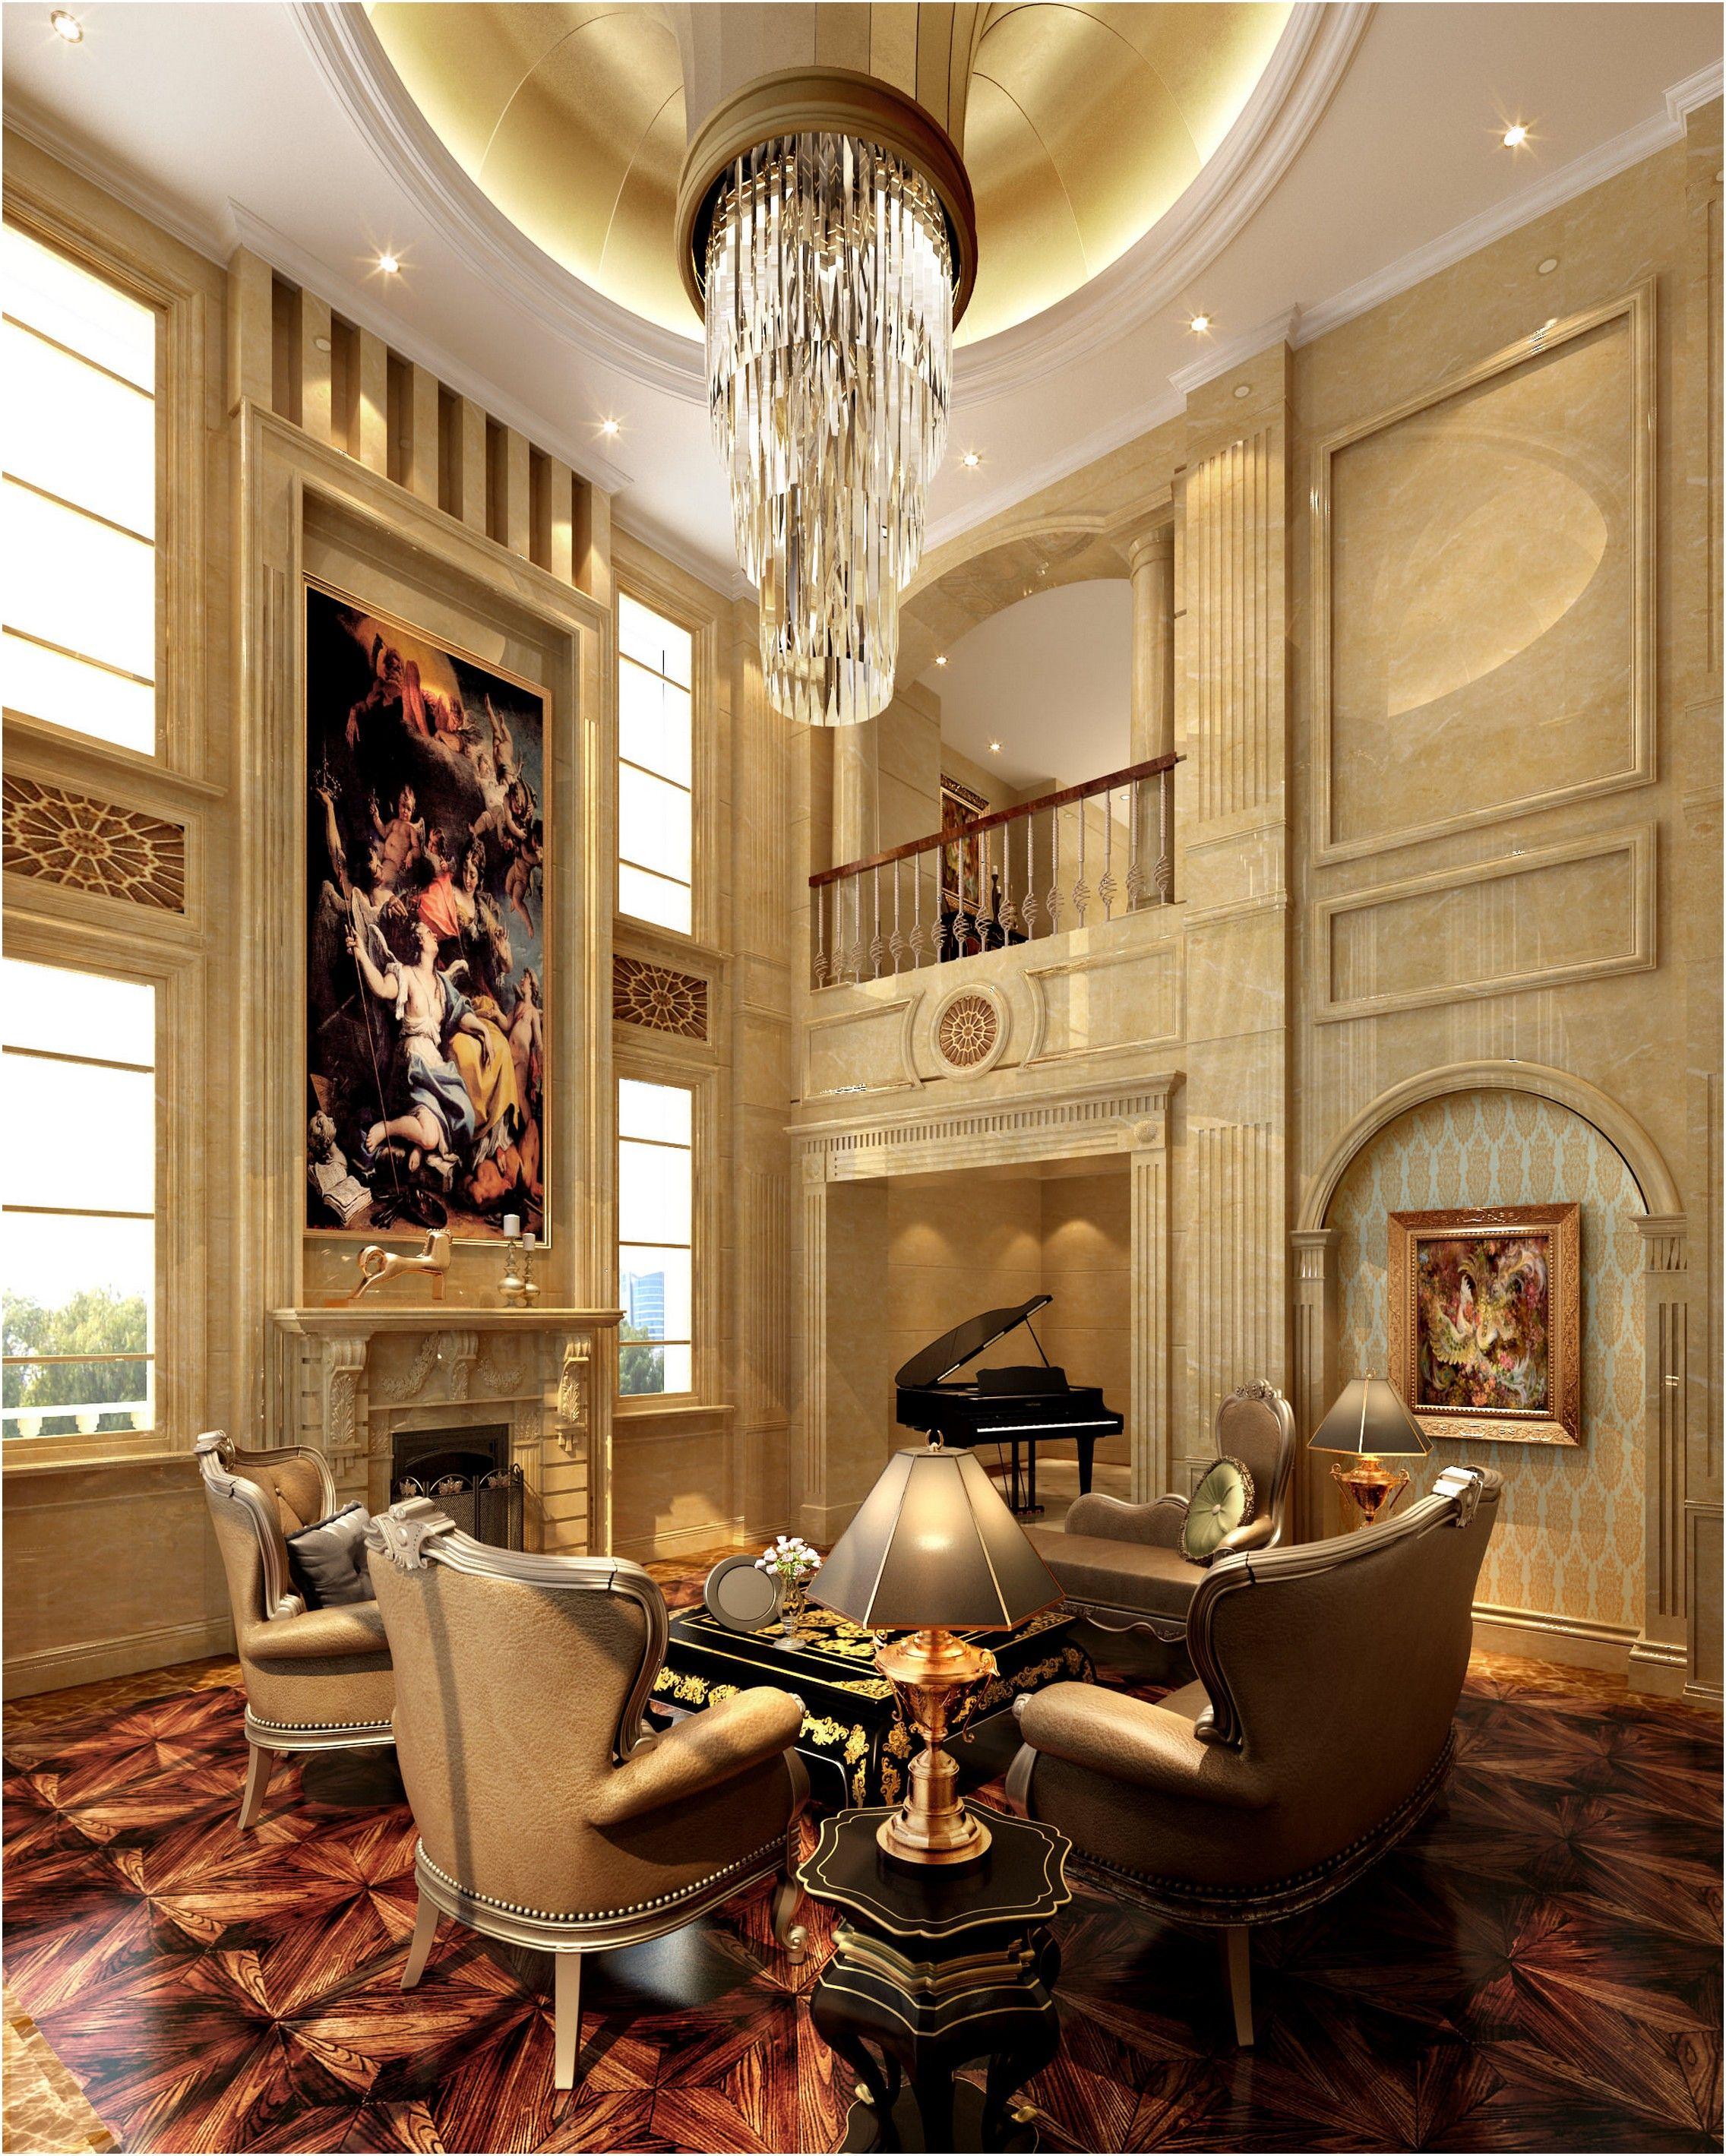 12 Modern Living Room Design Ideas From Different Countries 9 In 2020 Luxury Living Room Luxury Living Room Decor Living Room Furniture Uk